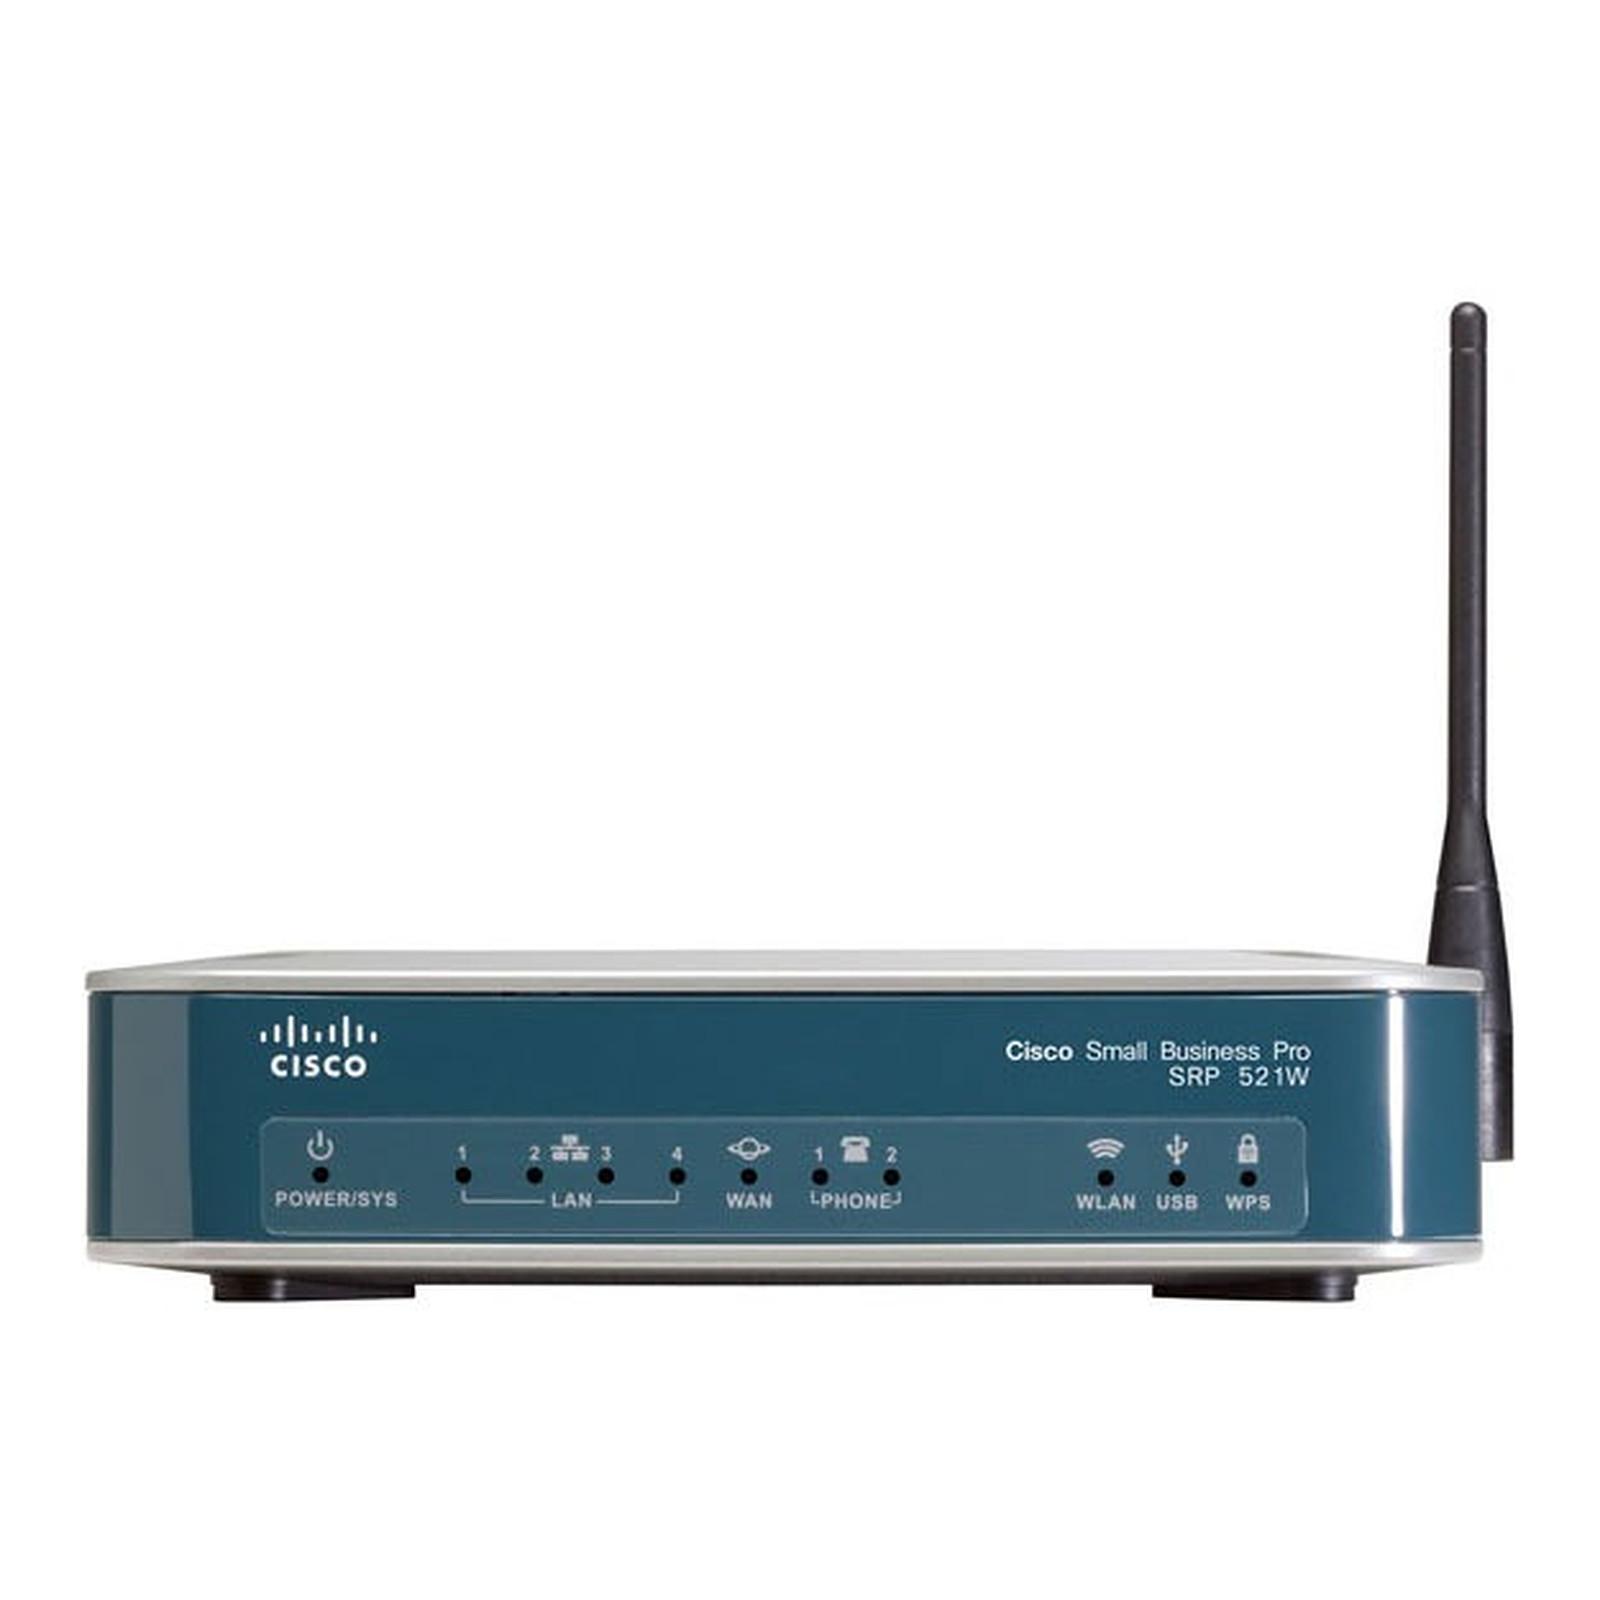 Cisco Small Business Pro SRP 521W